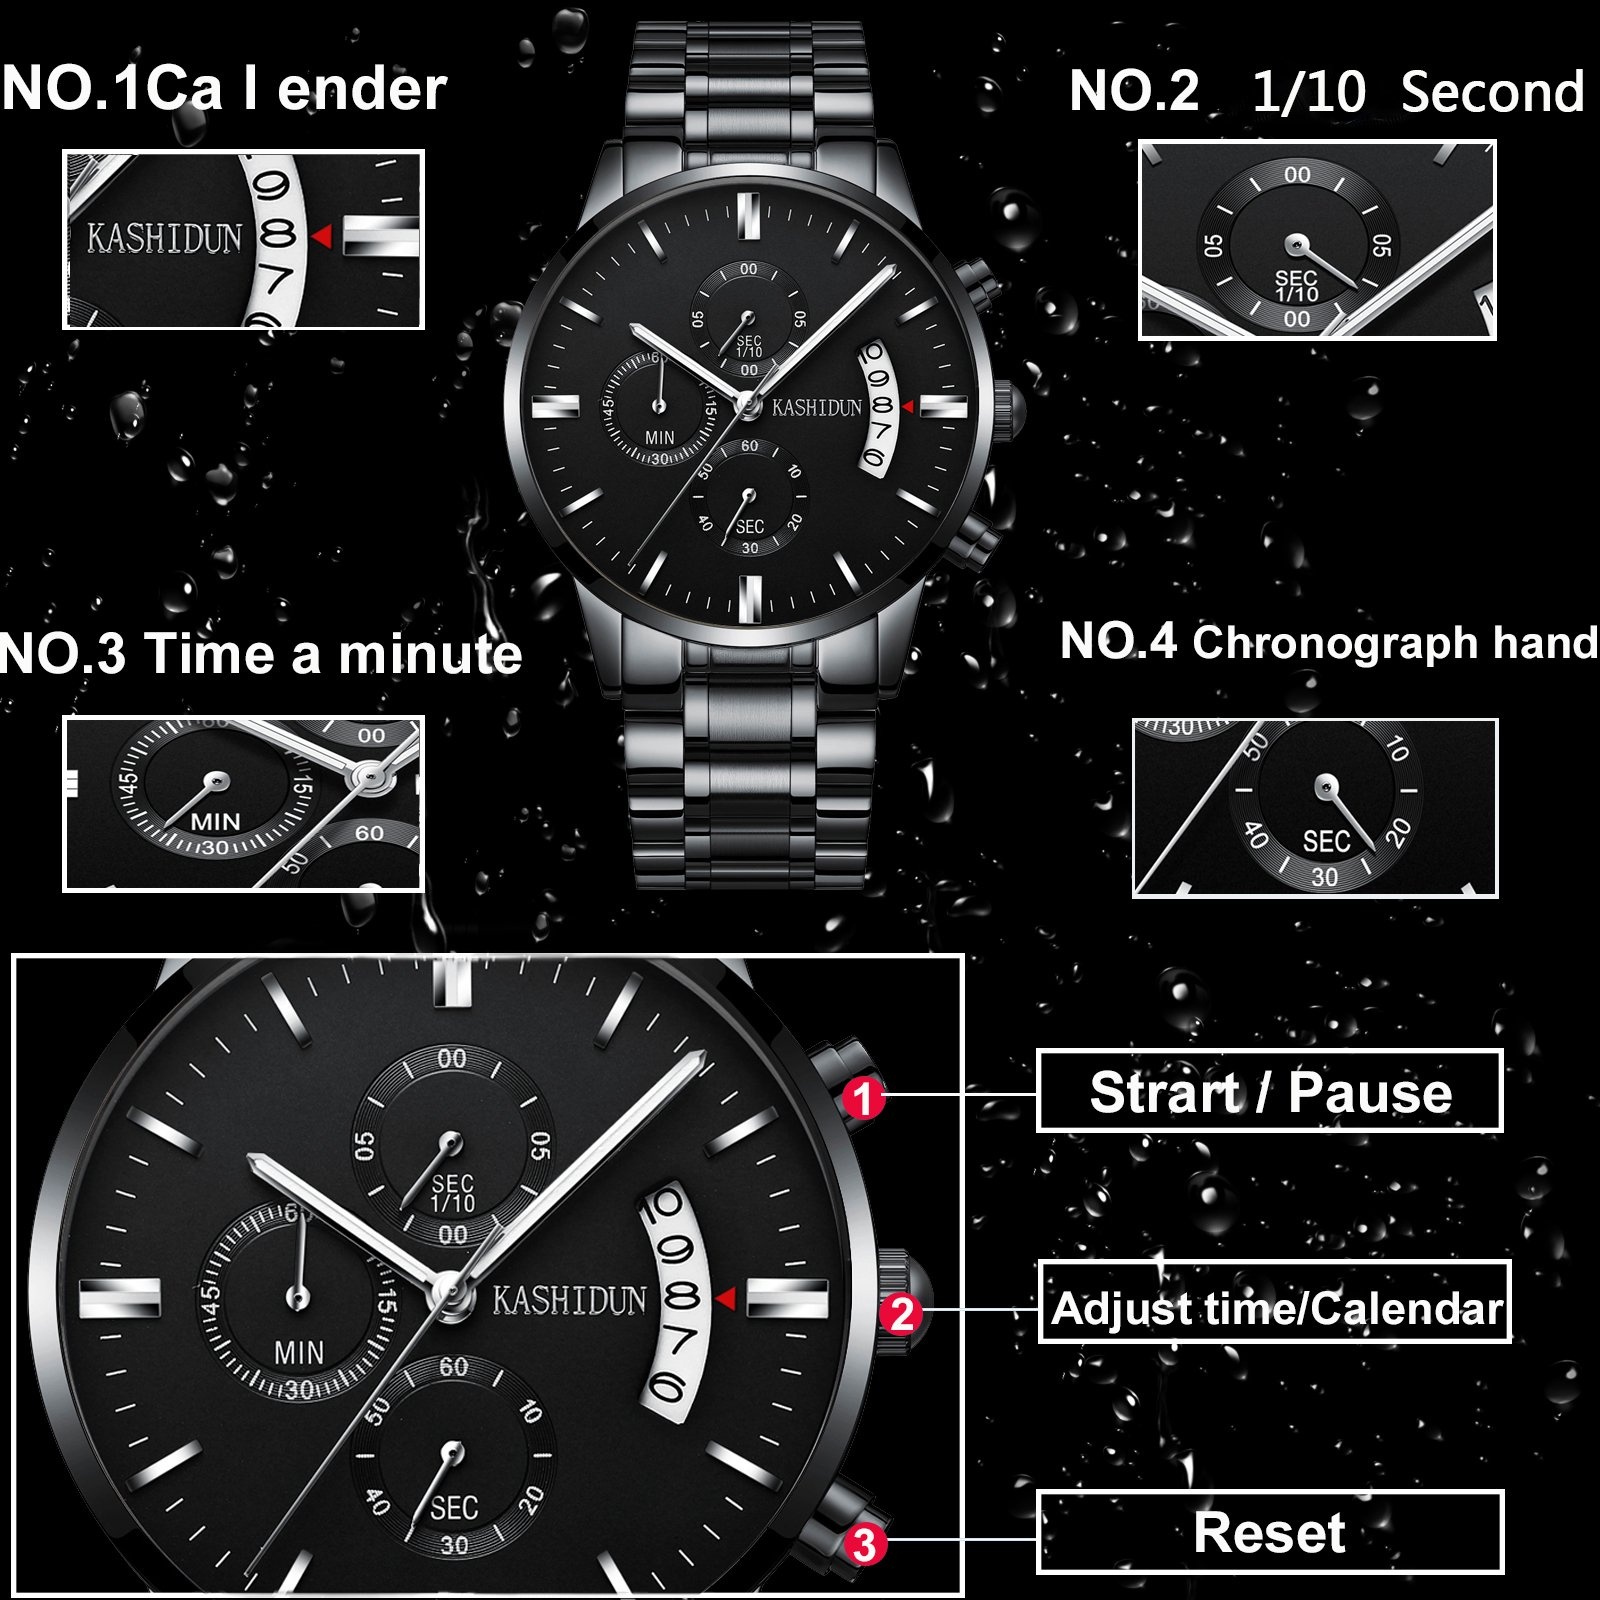 Mens Stainless Steel Watches Men Chronograph Waterproof Sport Date Quartz Wristwatch Classic Watch Black Color by KASHIDUN (Image #6)